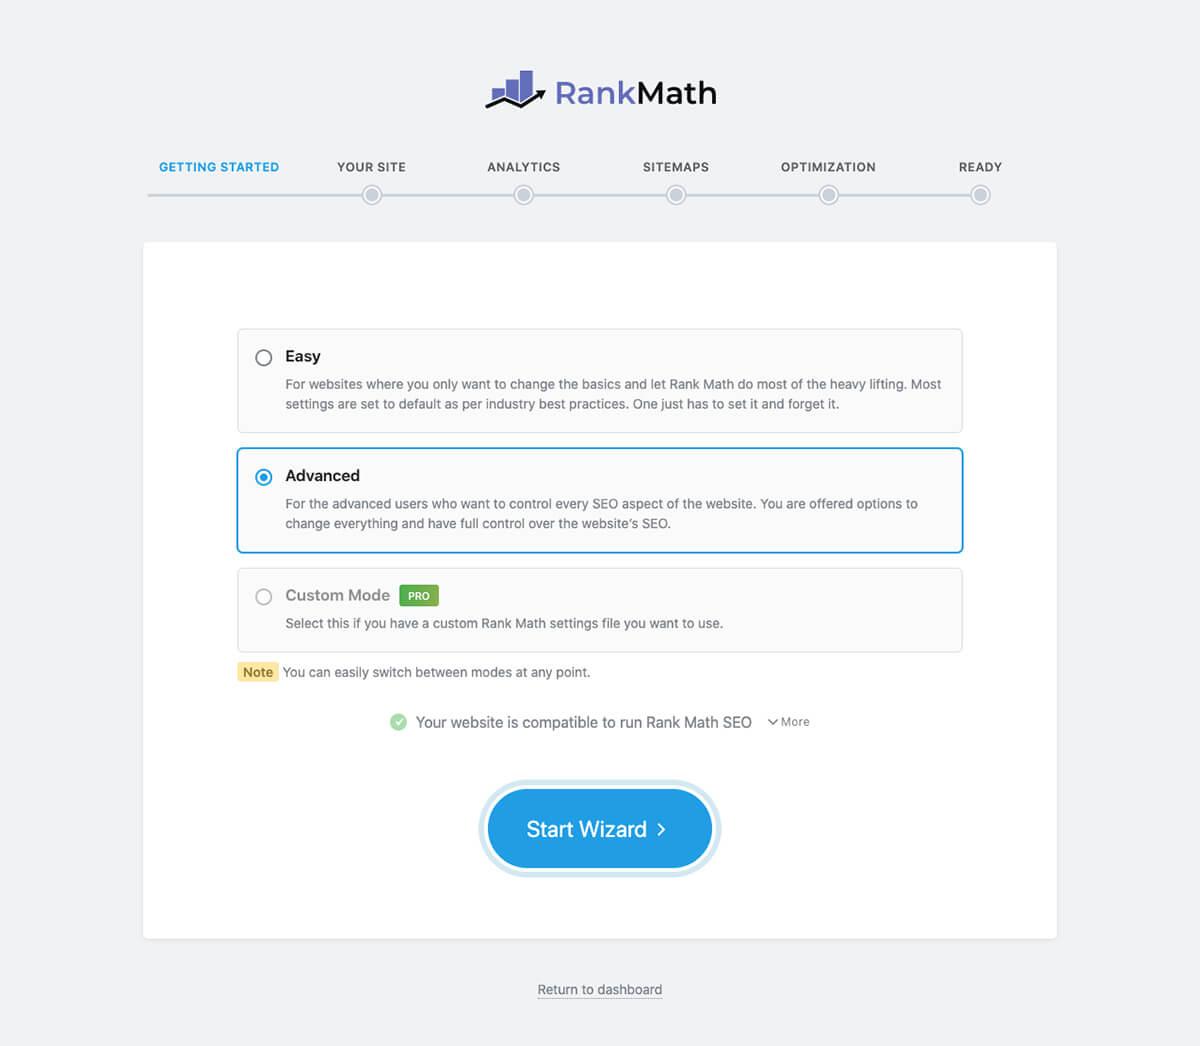 Rank Math Pro Seo Setup Wizard